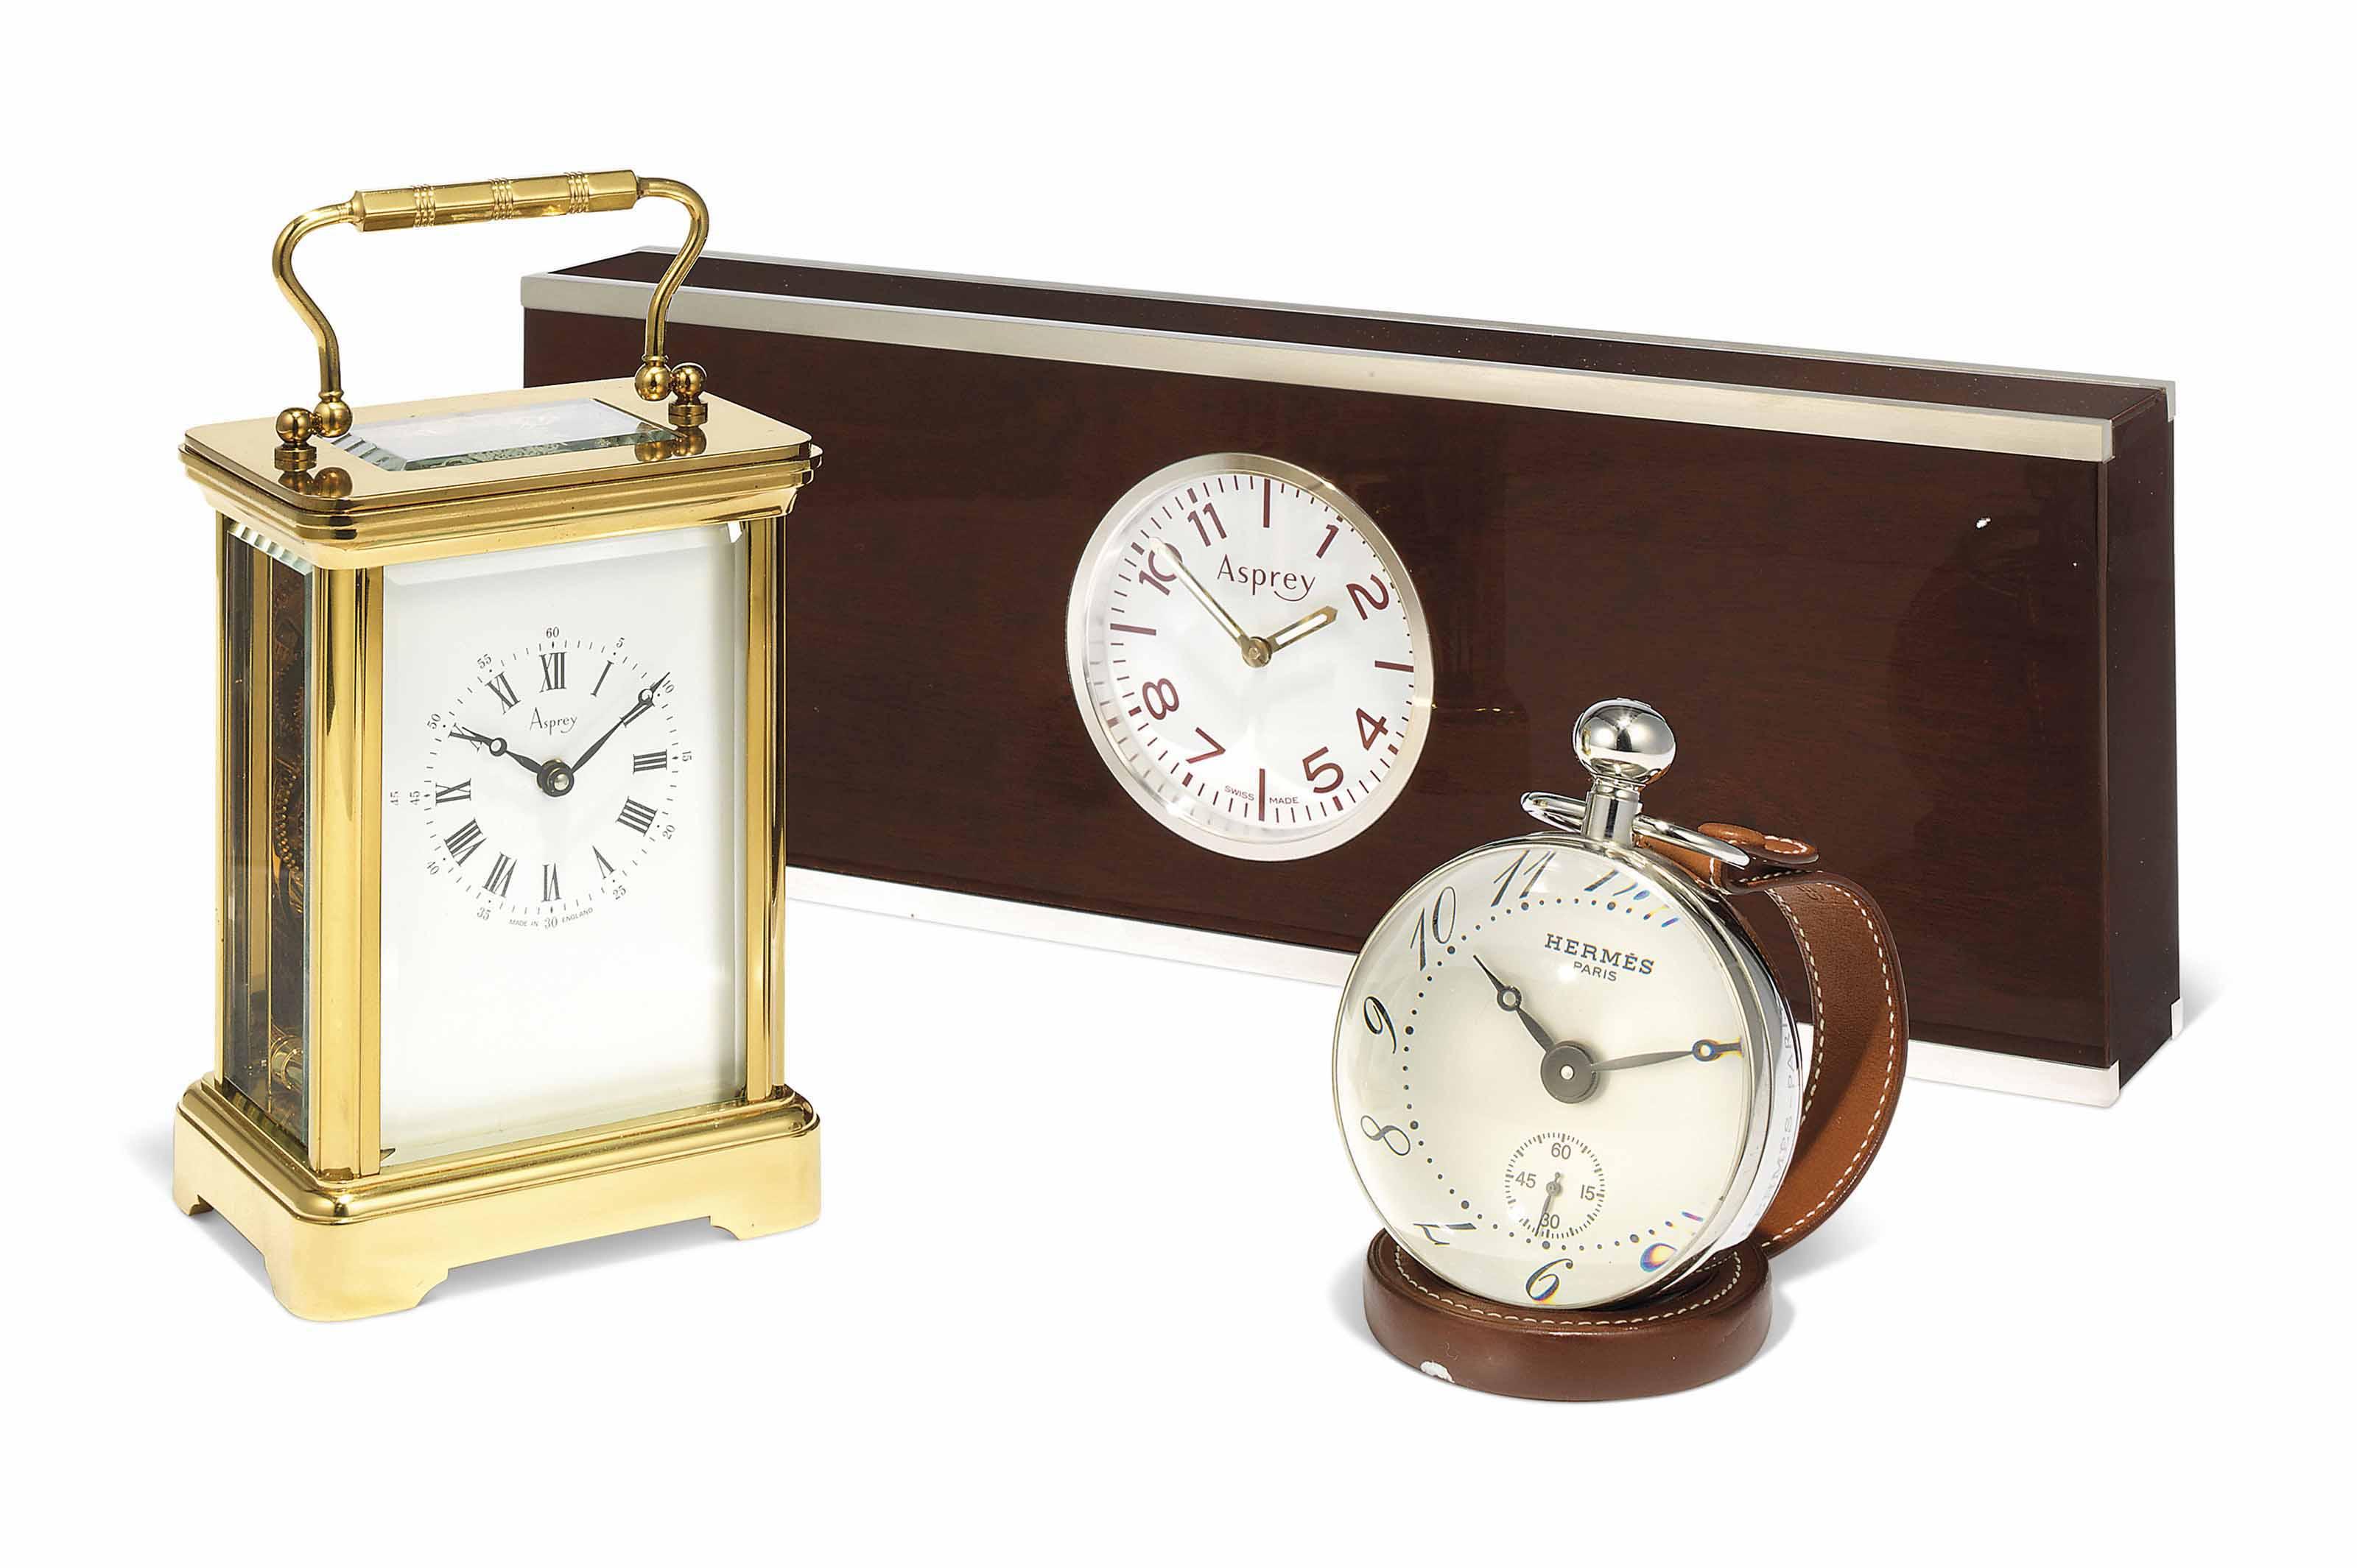 A GILT-BRASS CARRIAGE TIMEPIEC